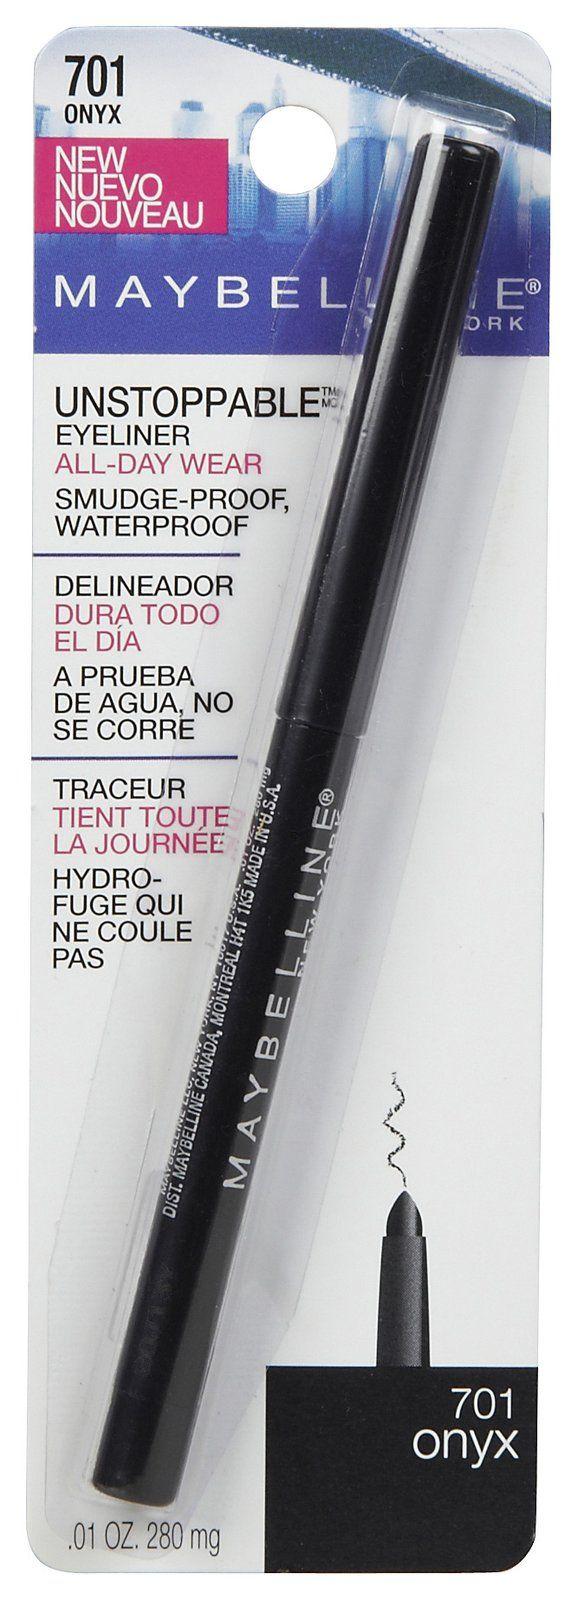 34 Best Waterproof Blinds Images On Pinterest: 34 Best Eyeliner Ideas Images On Pinterest